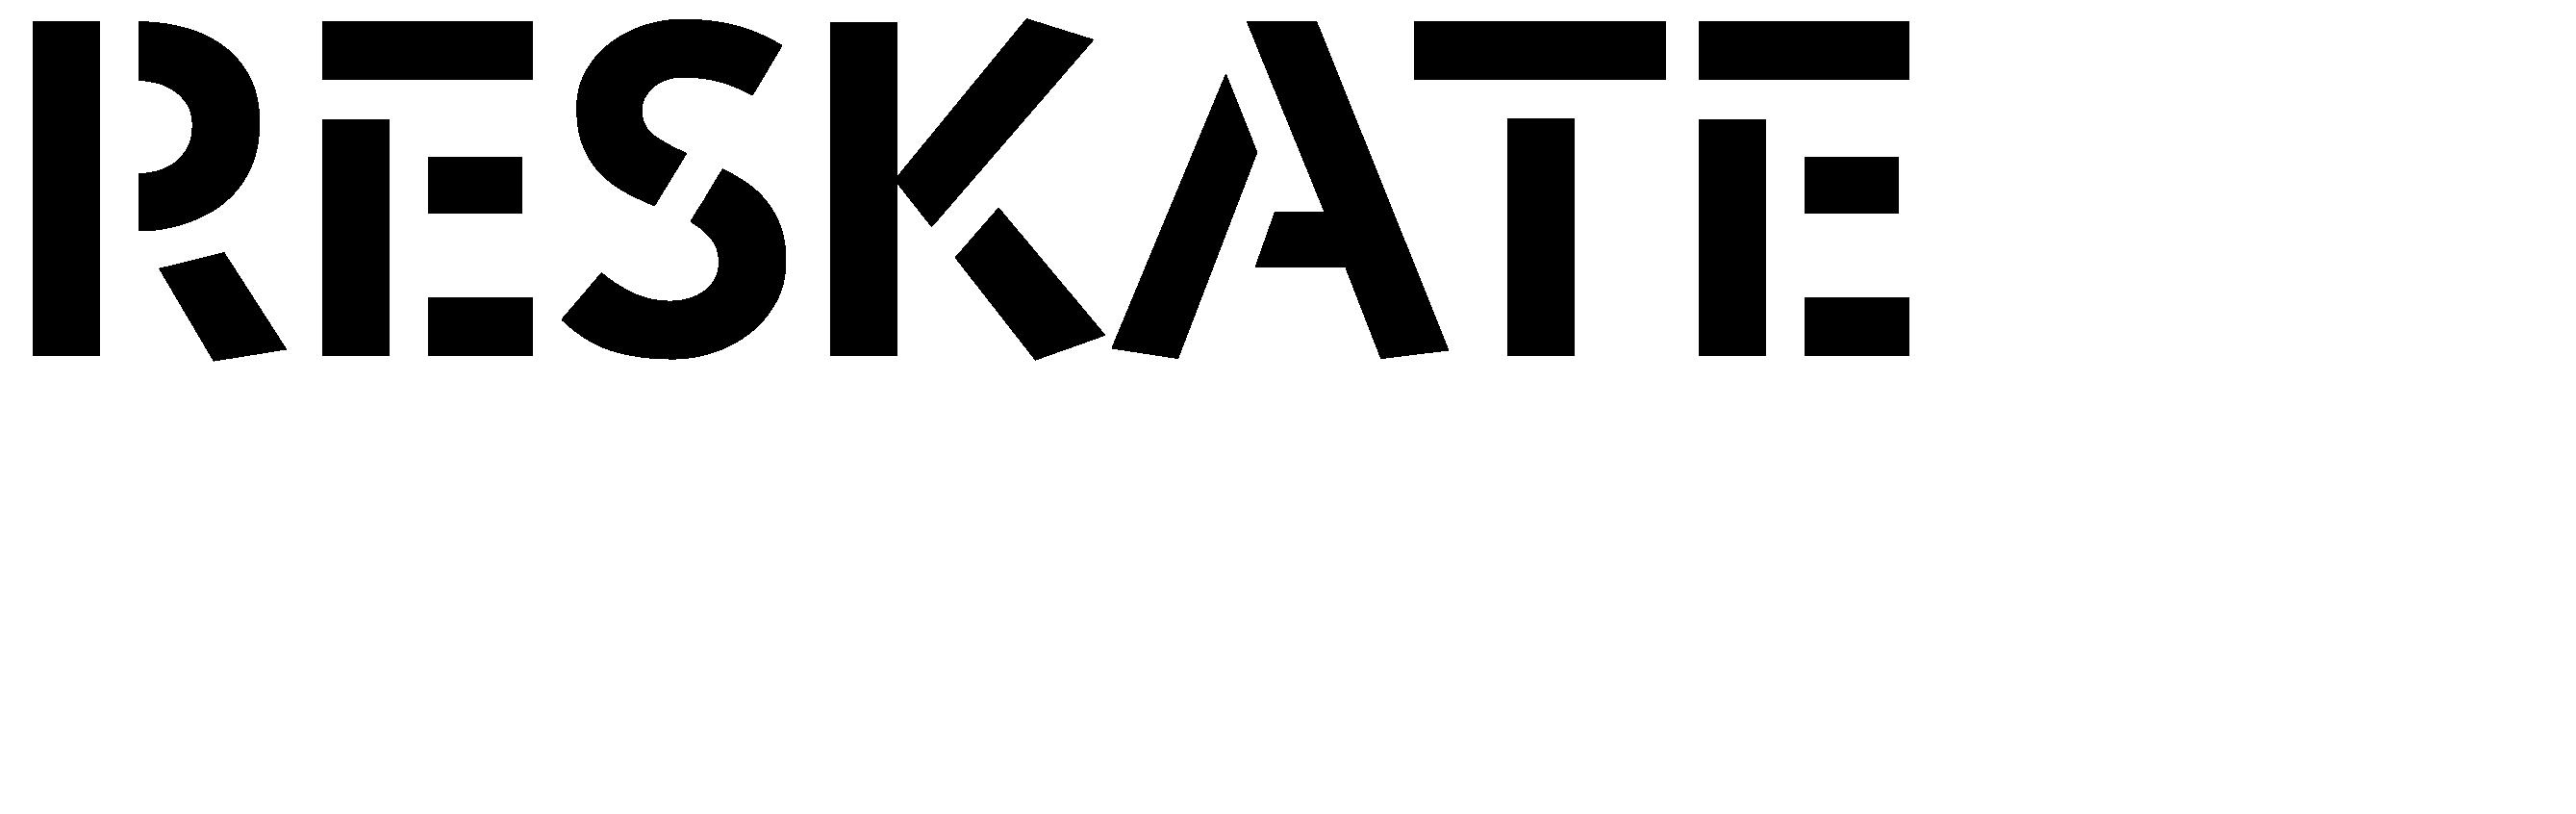 RESKATE